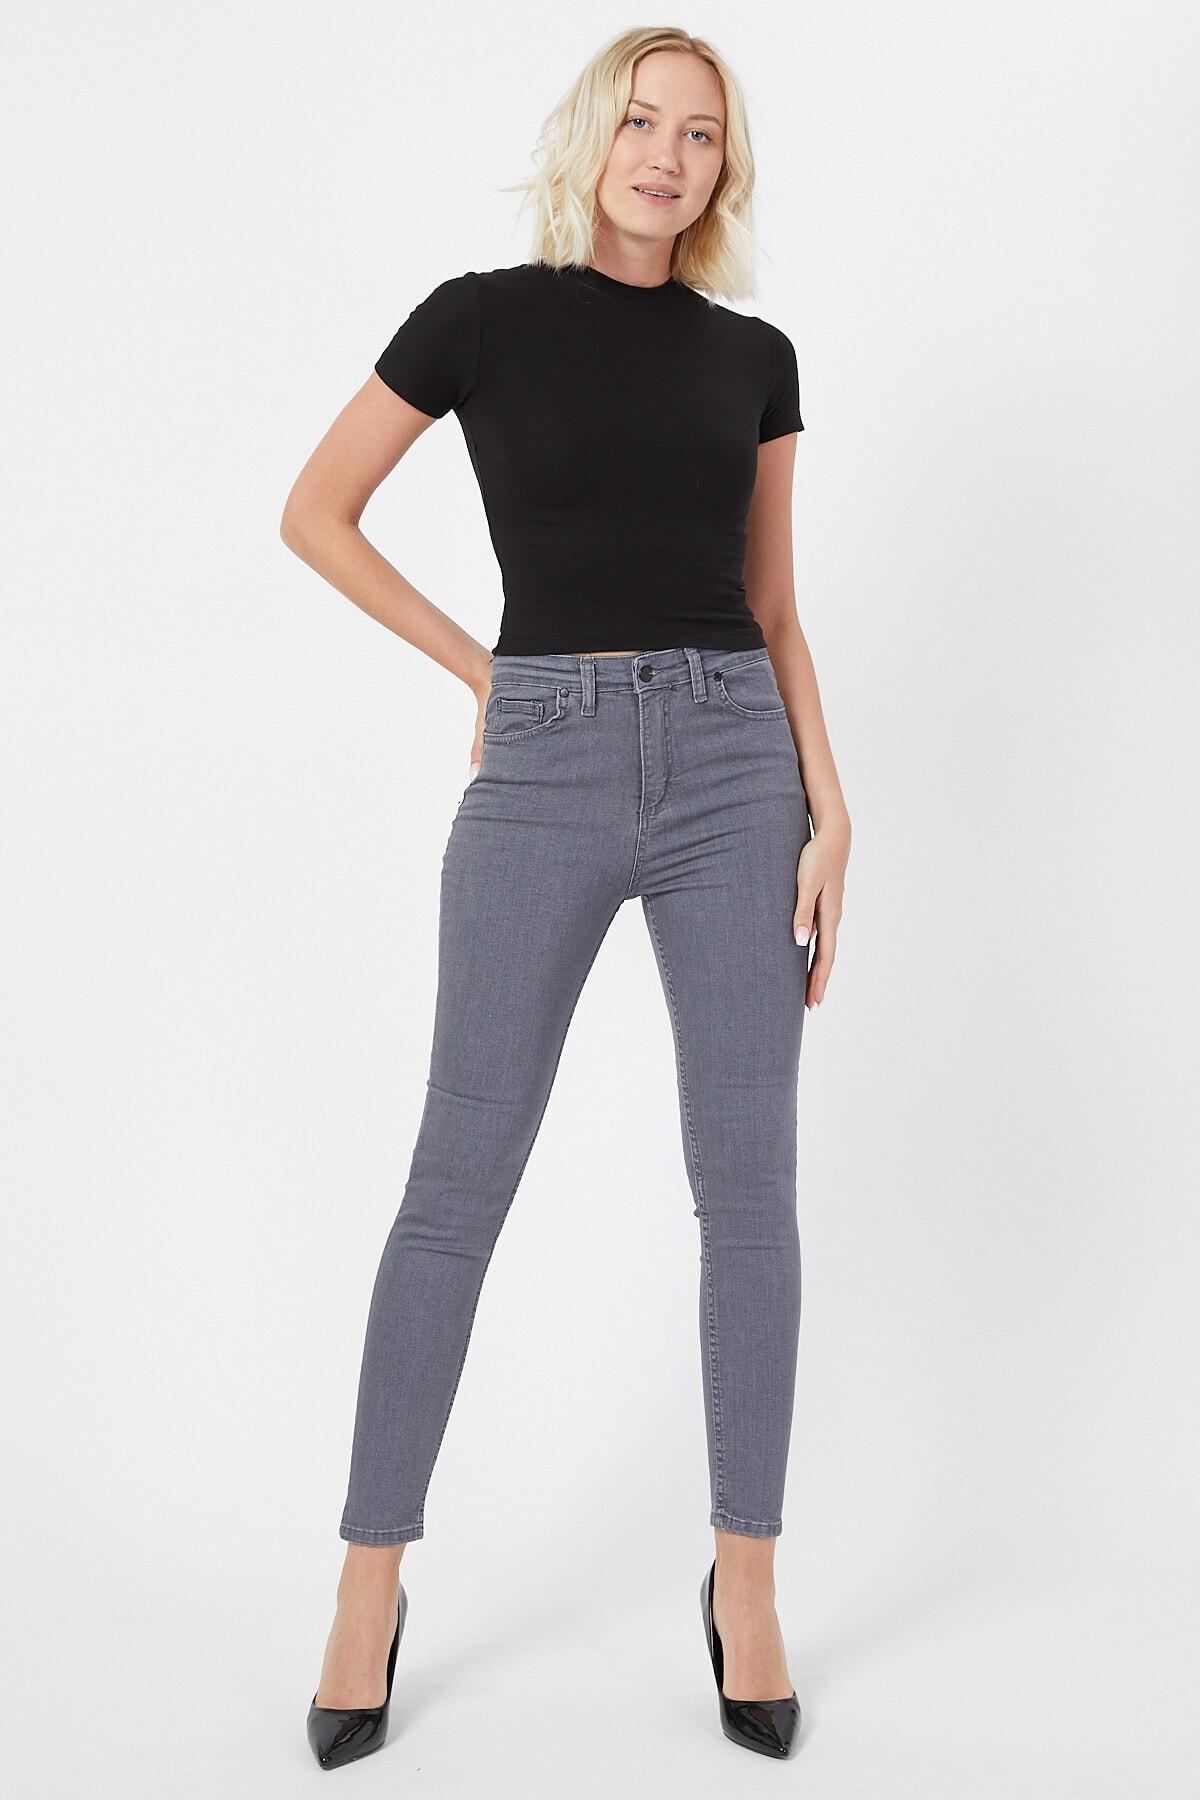 Kadın Gri  Dar Paça Yüksek Bel Kot Pantolon